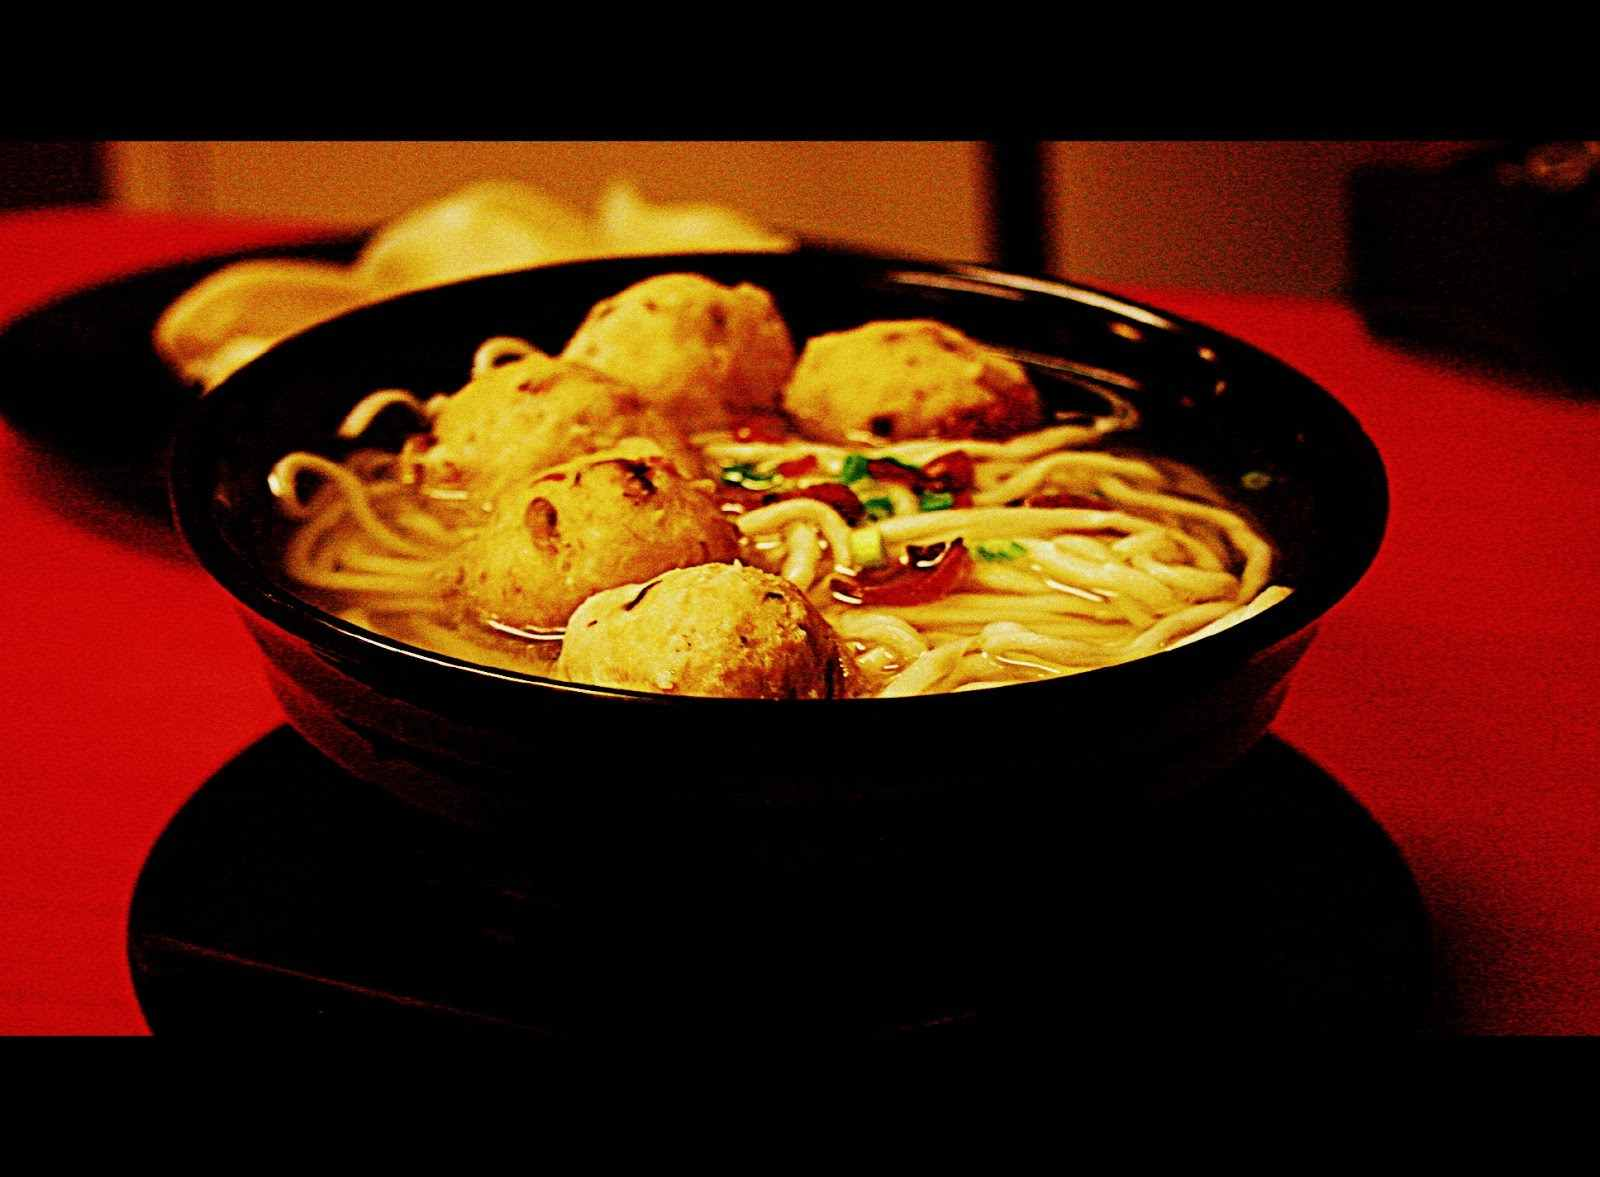 Mushroom noodle soup at Tasty Dumplings in Binondo